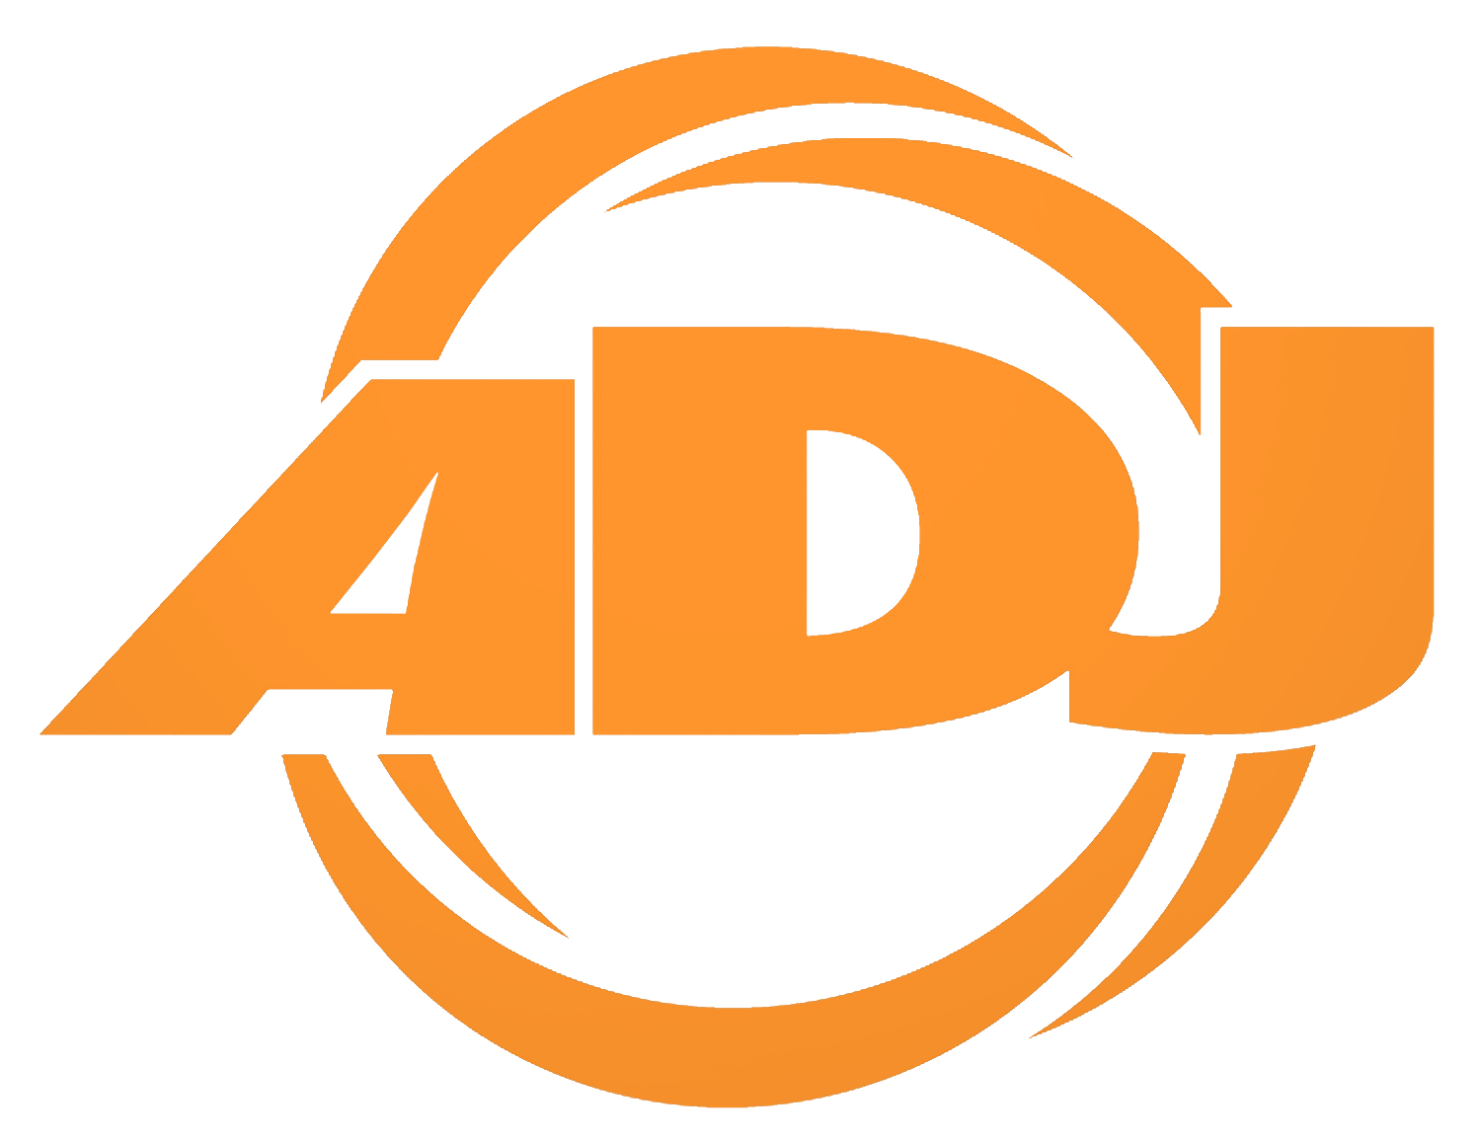 ADJ Products